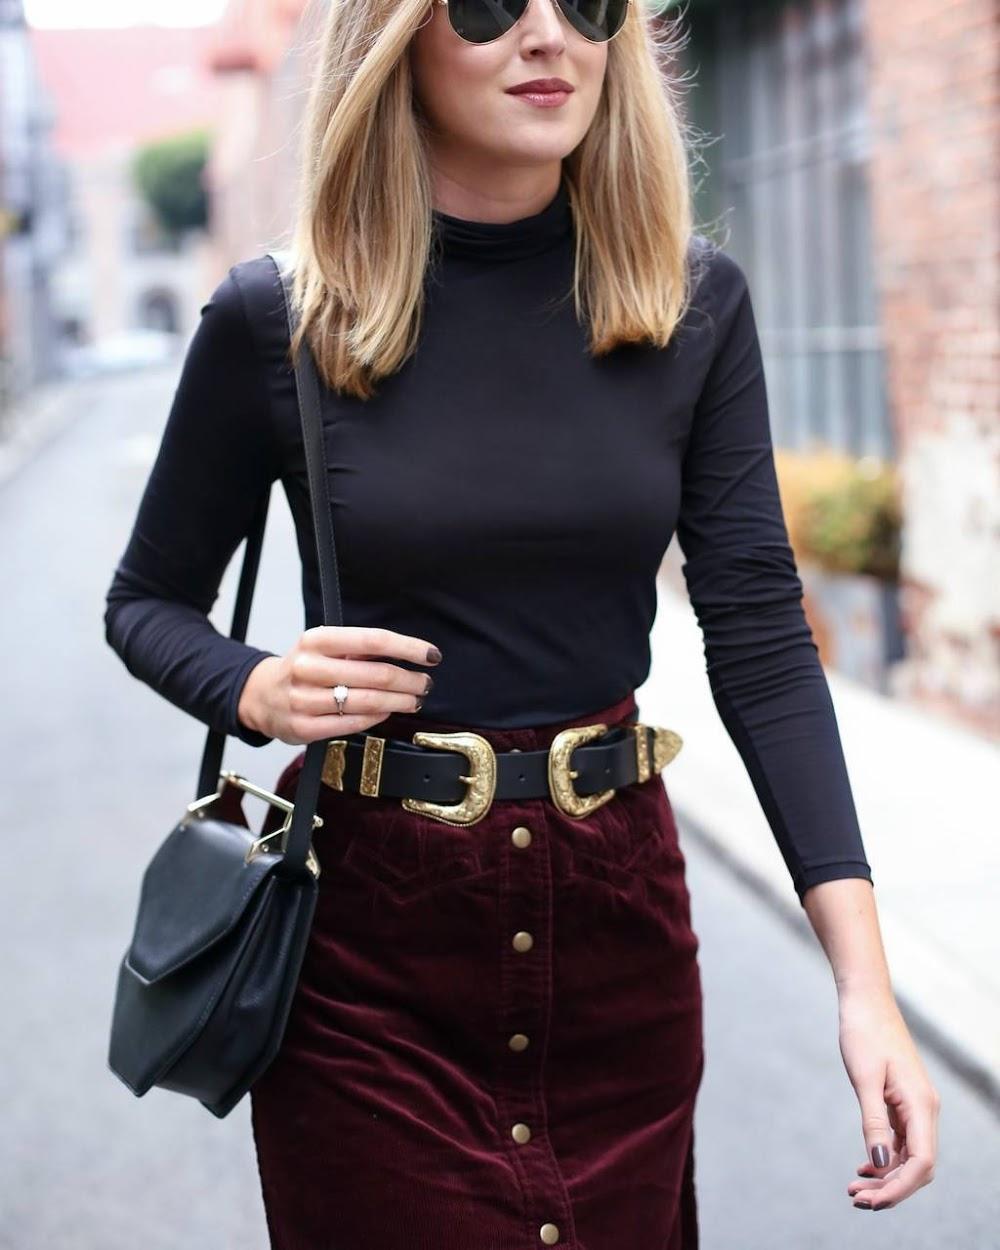 fashion belts_image